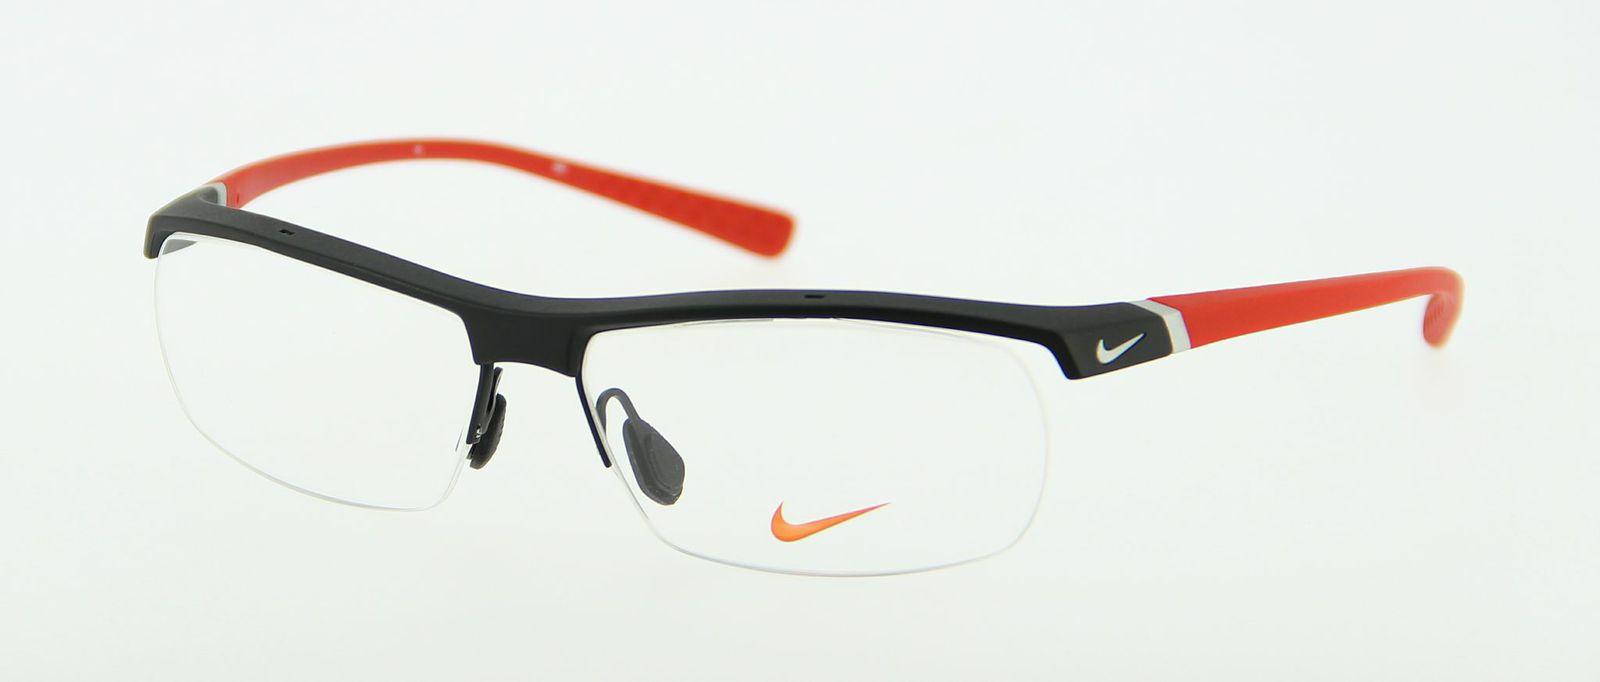 NikeMens3.jpg